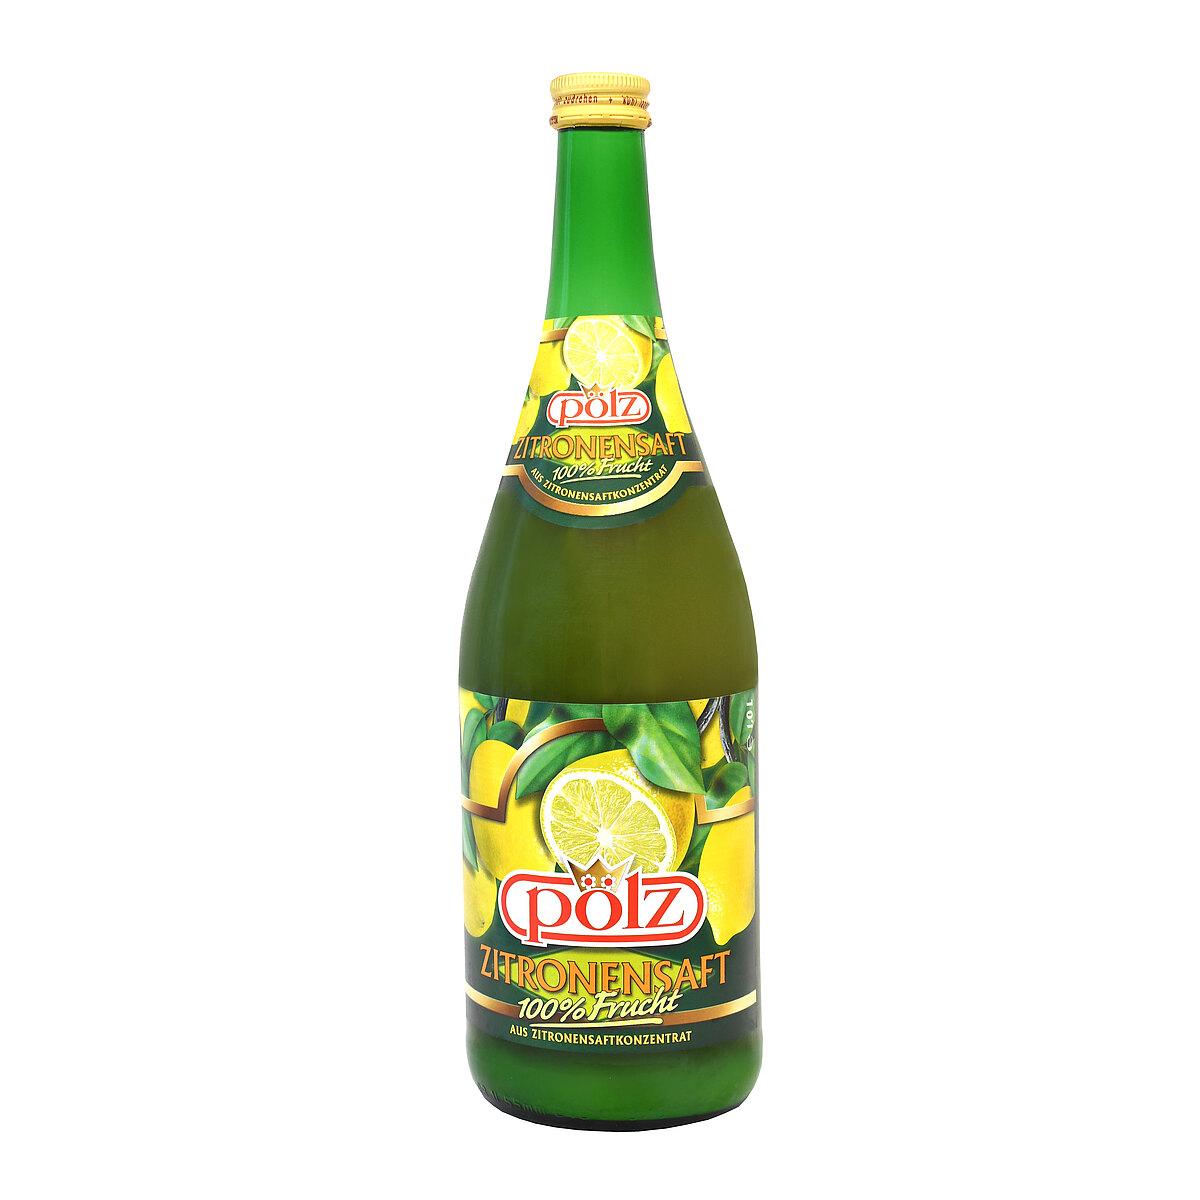 Zitronensaft Inhaltsstoffe